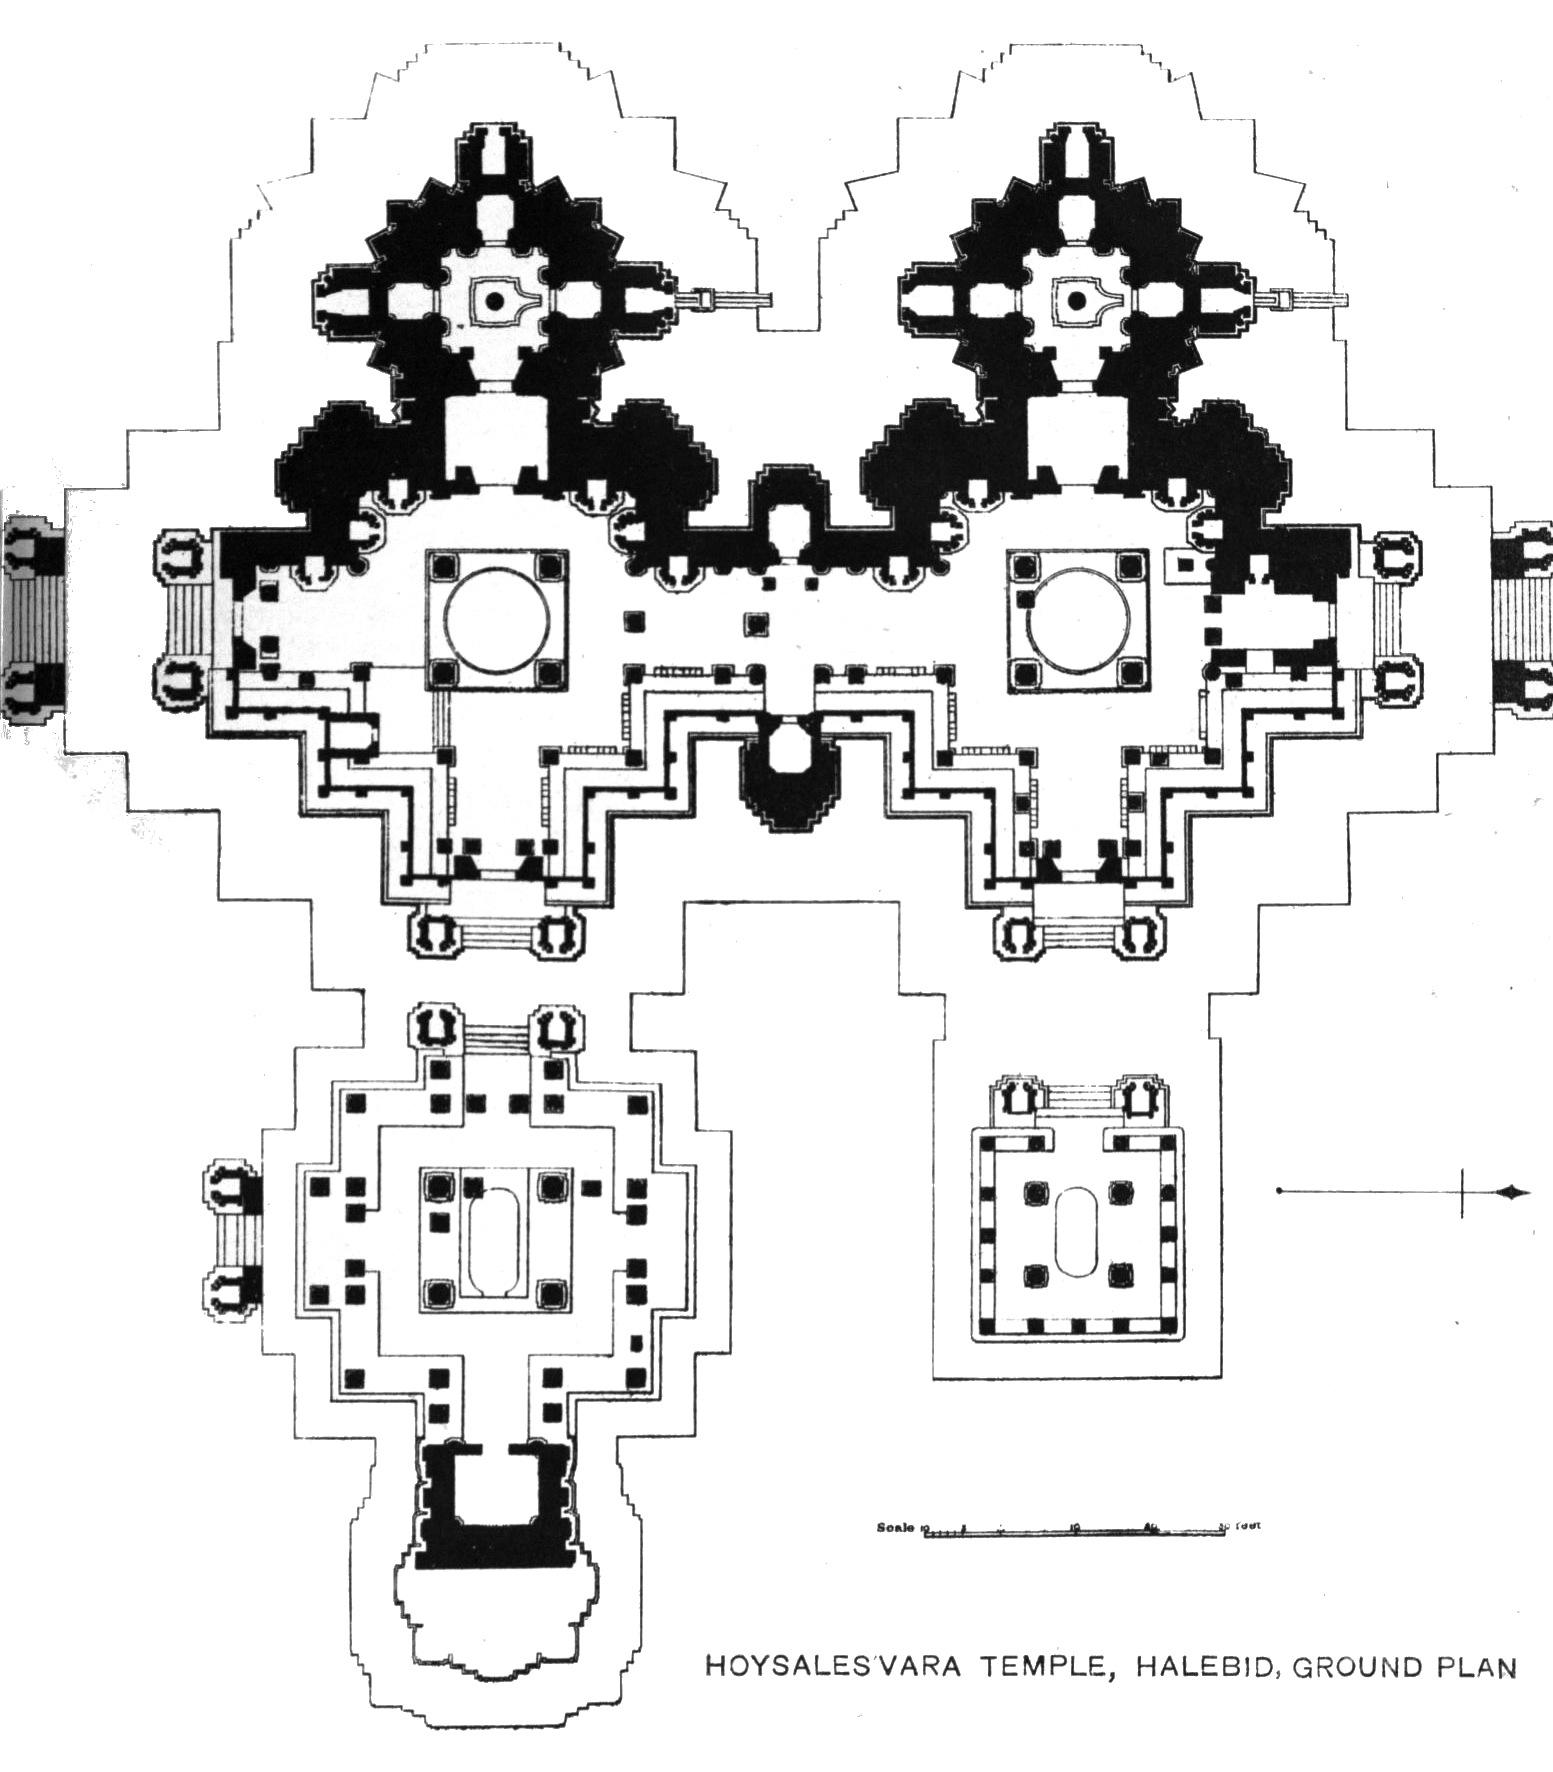 file halebid temple plan jpg wikimedia commons file halebid temple plan jpg